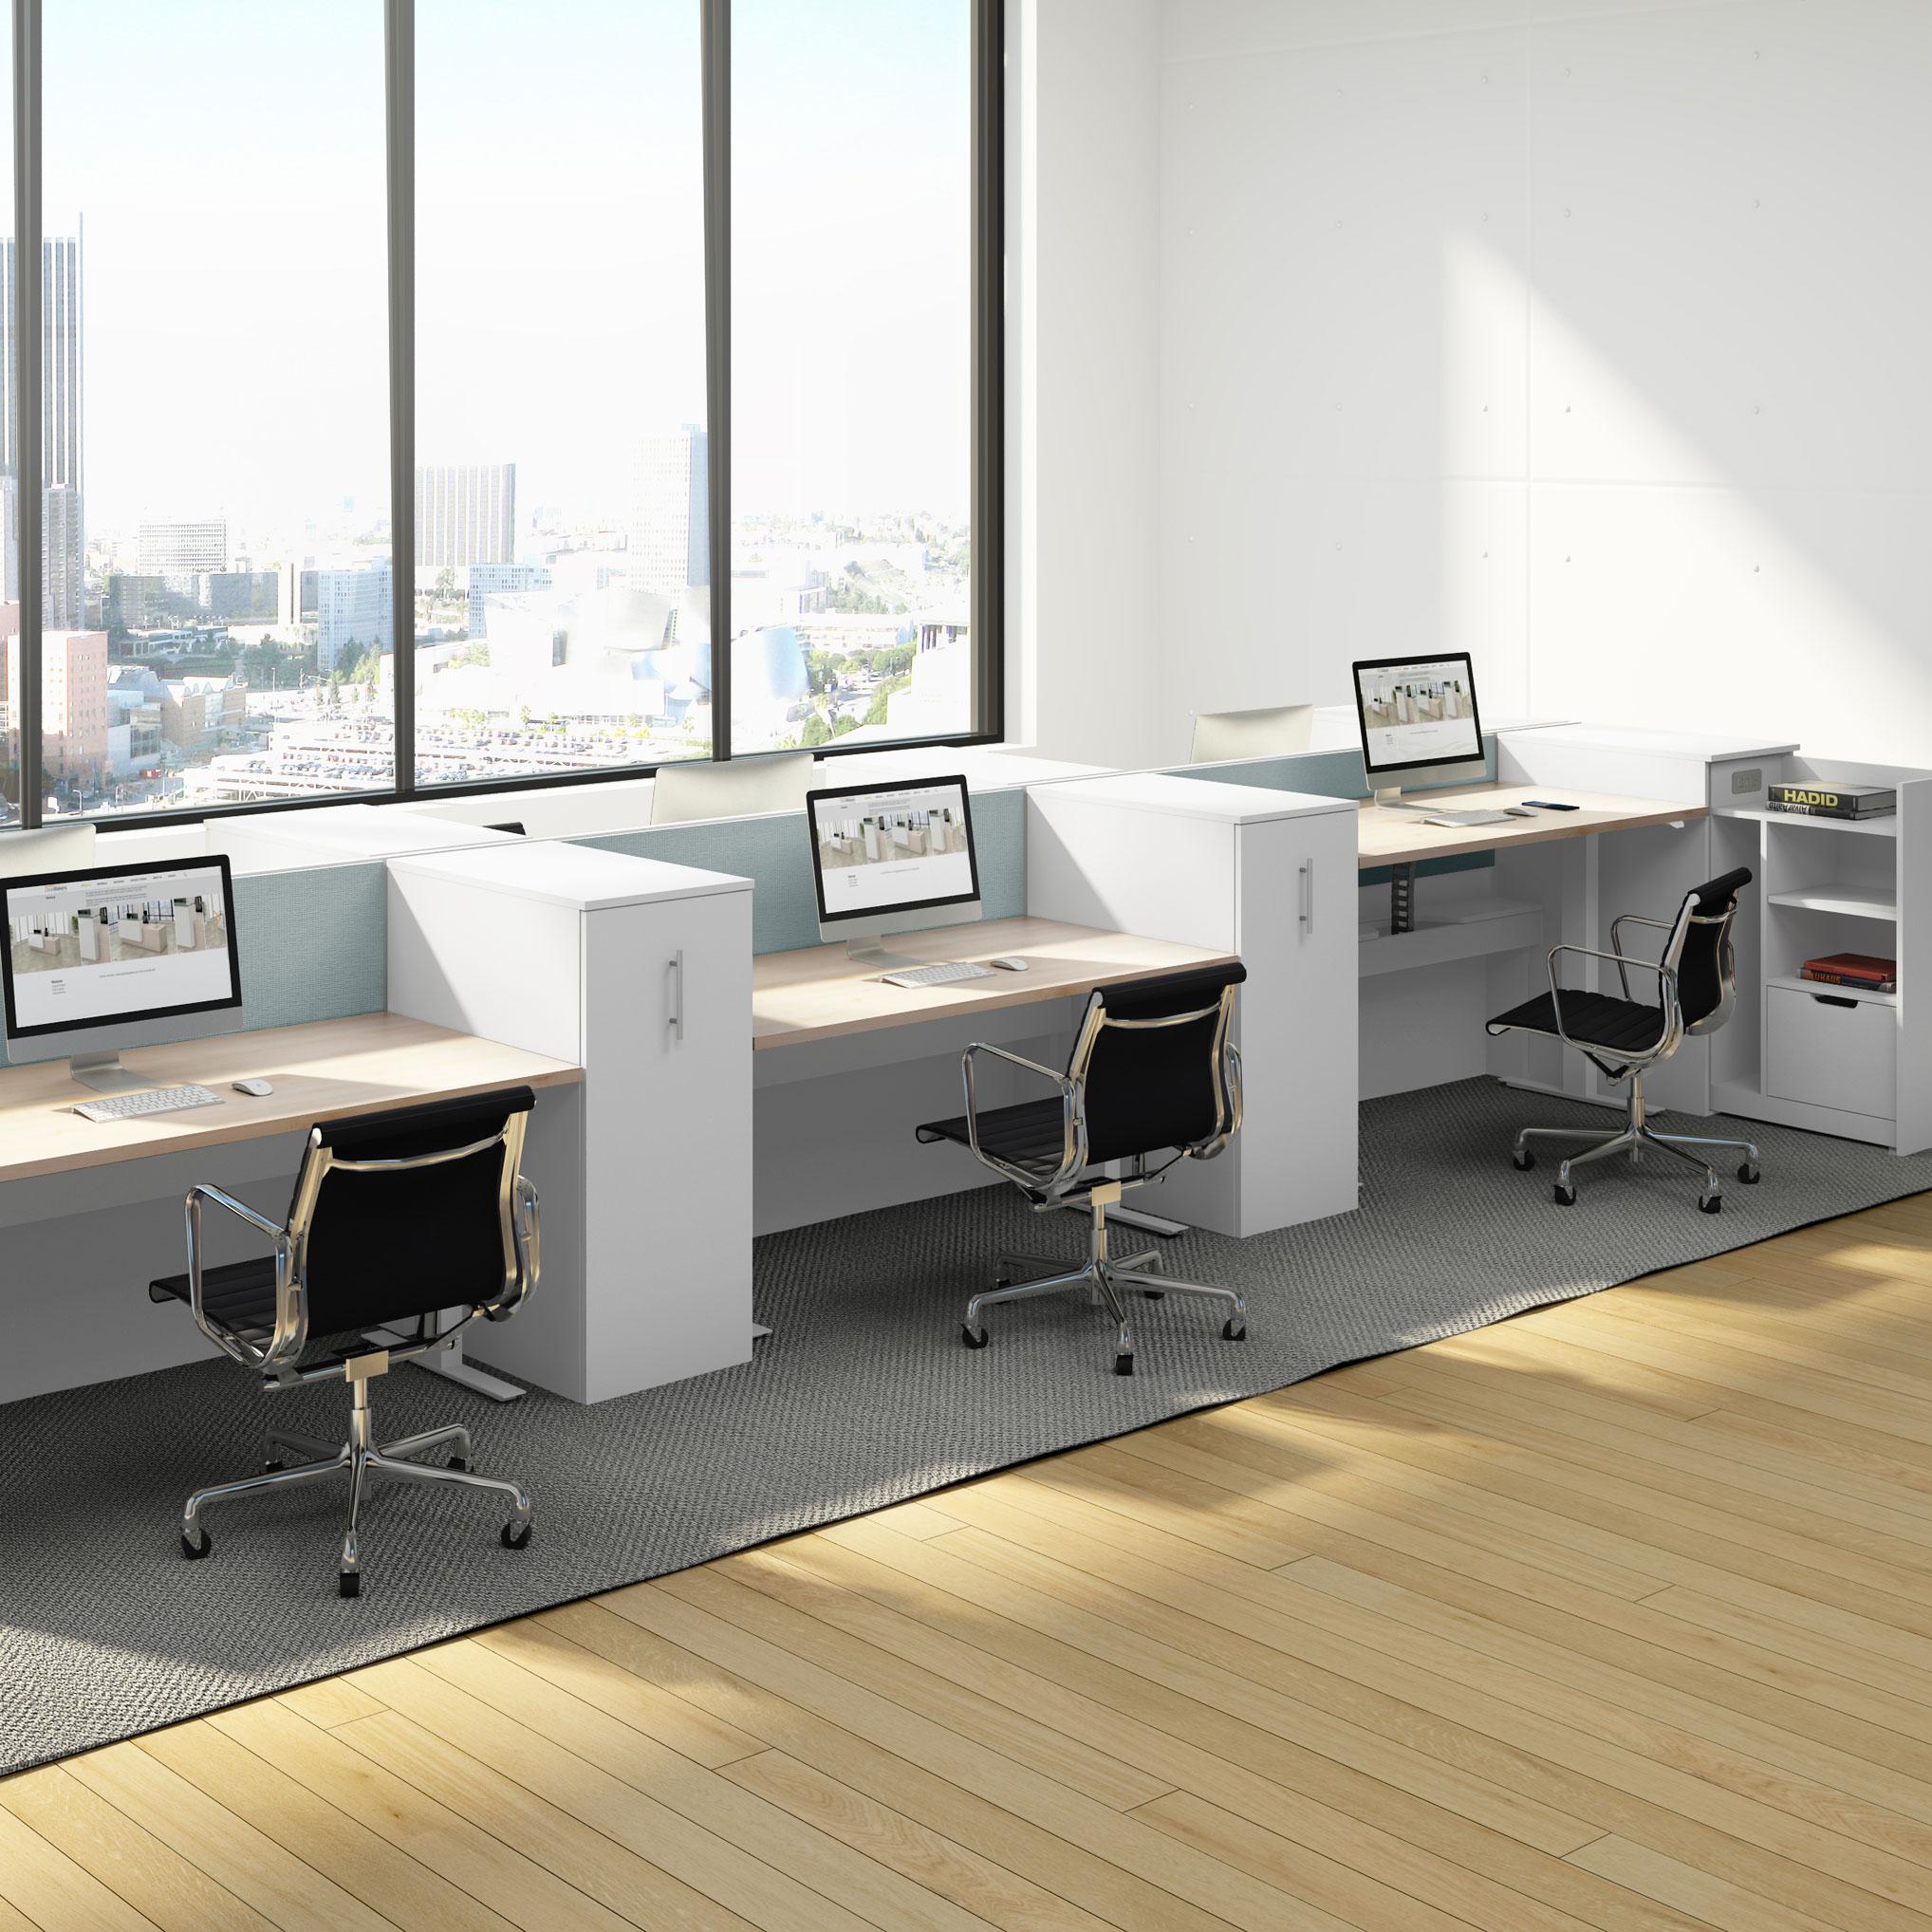 Tremendous Hover Open Plan Office Furniture Arthur P Ohara Inc Download Free Architecture Designs Scobabritishbridgeorg